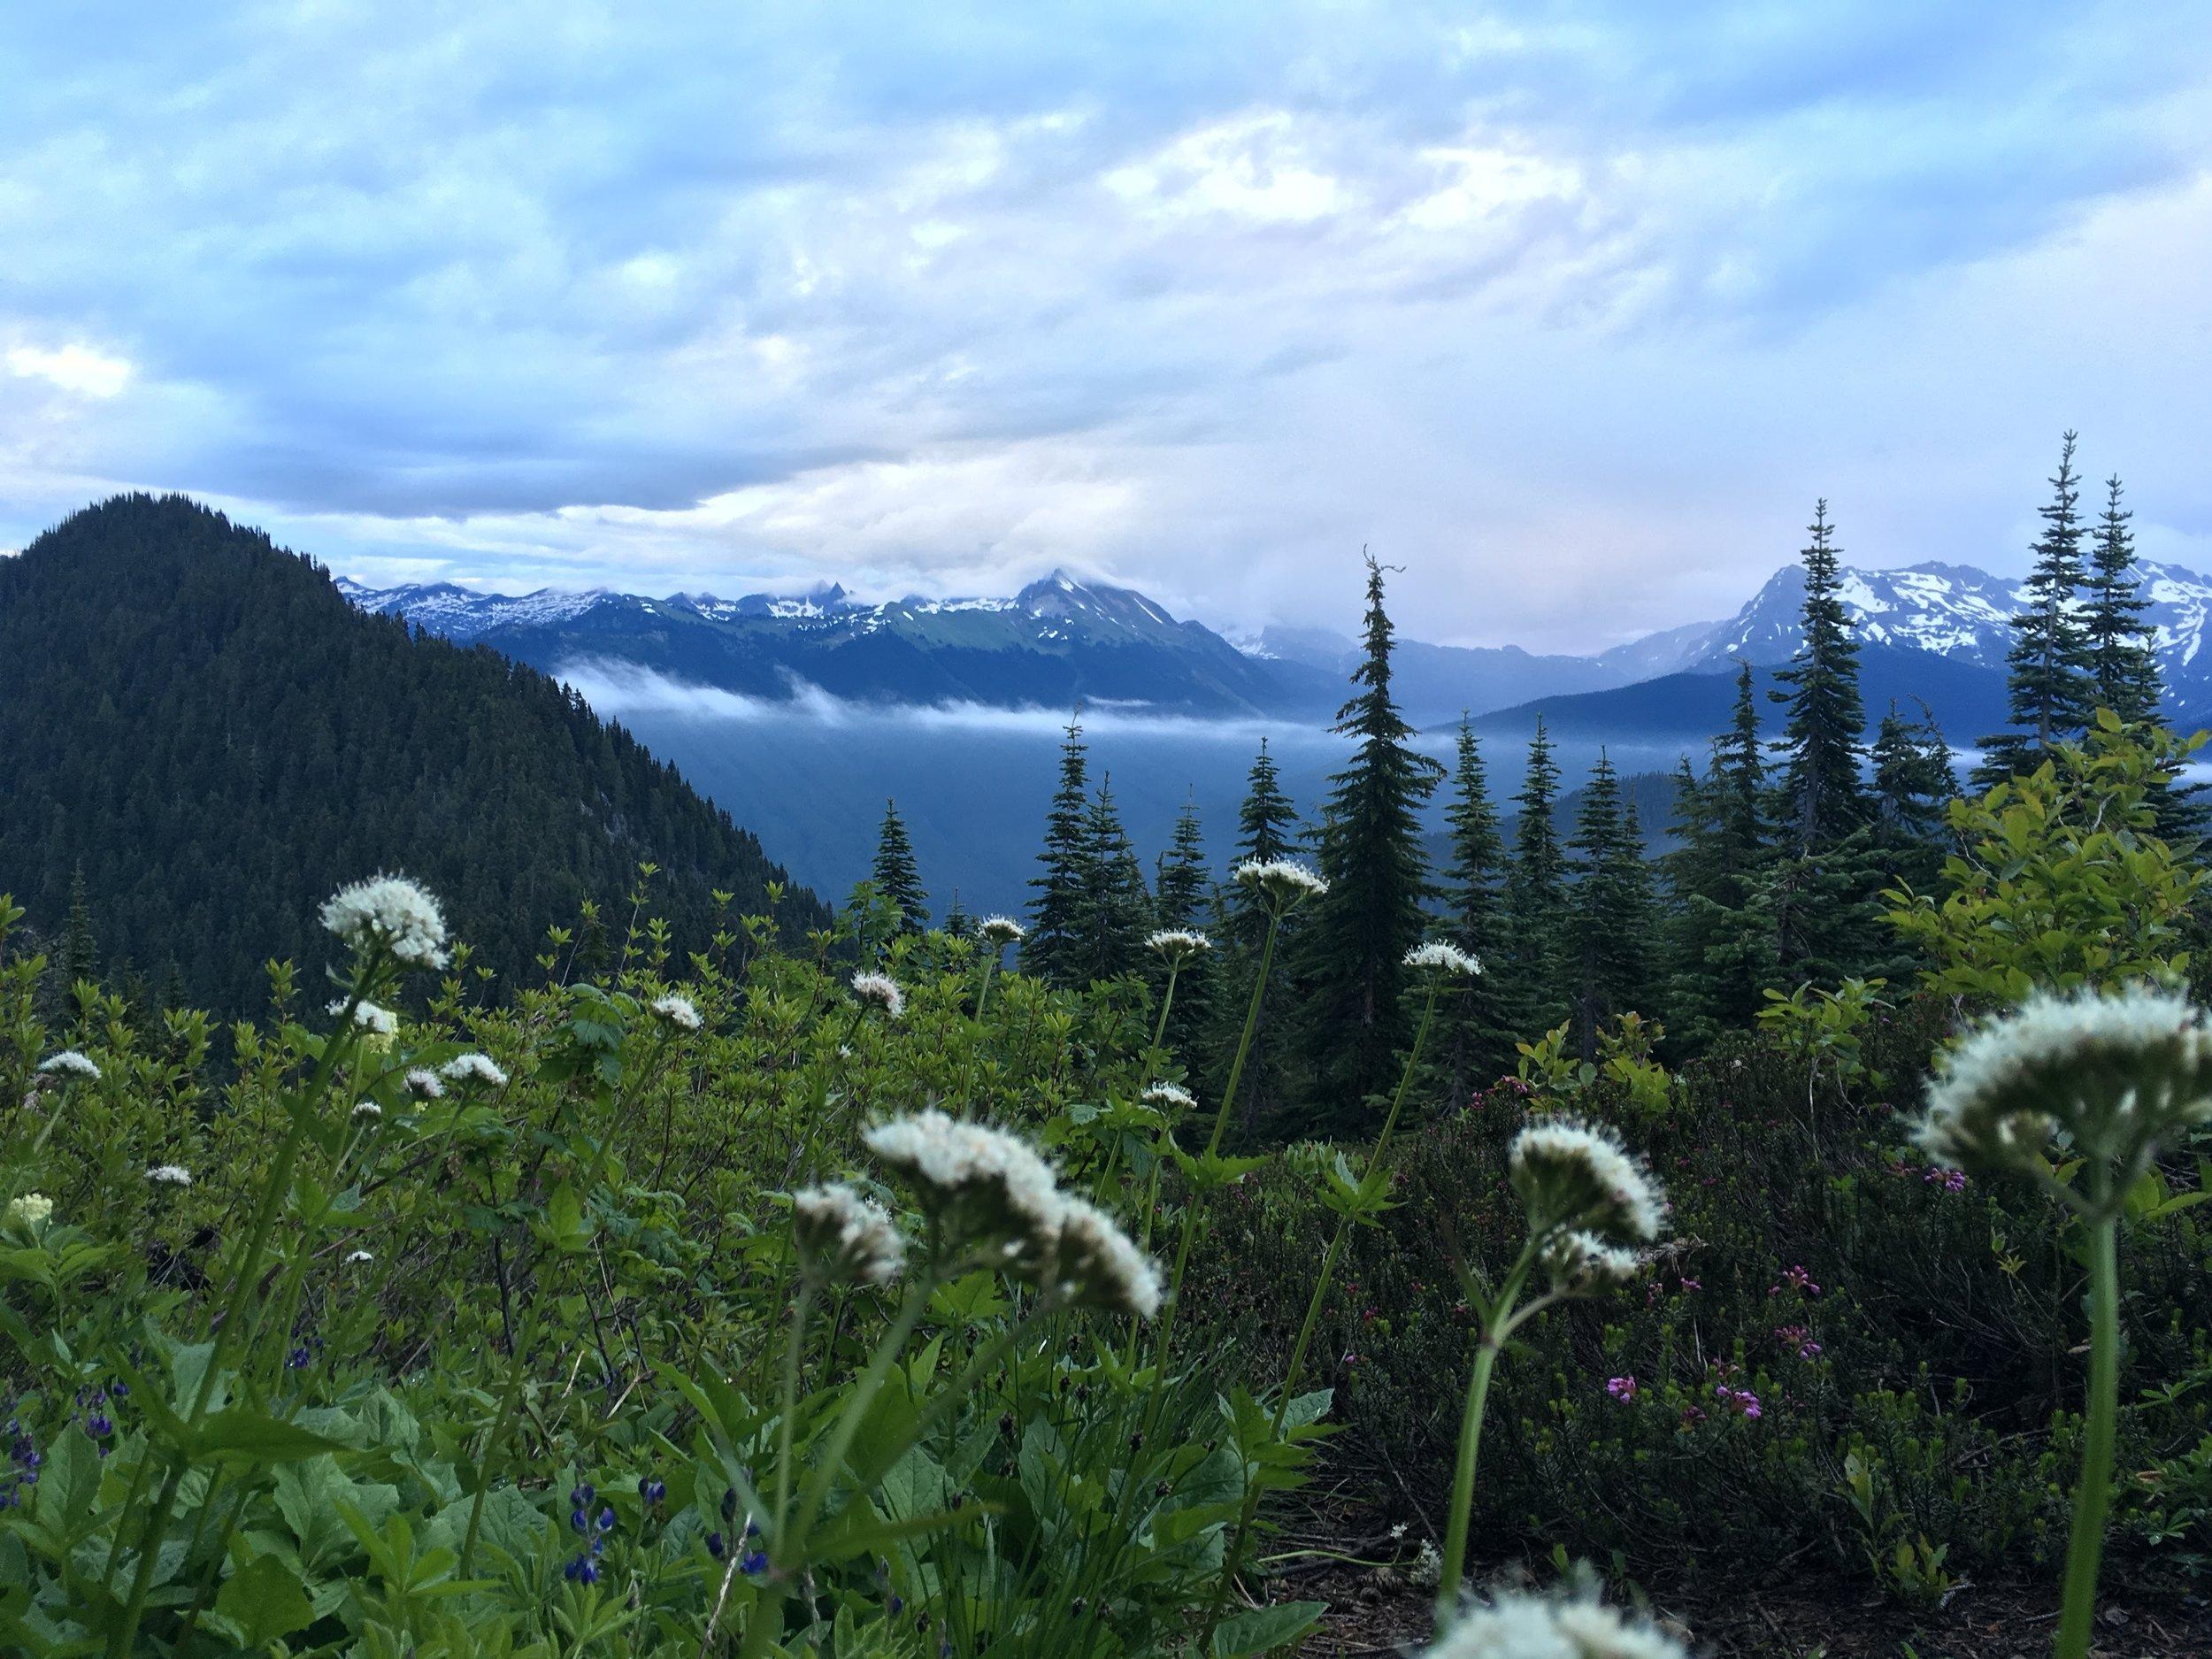 Dolly Vista Ridge